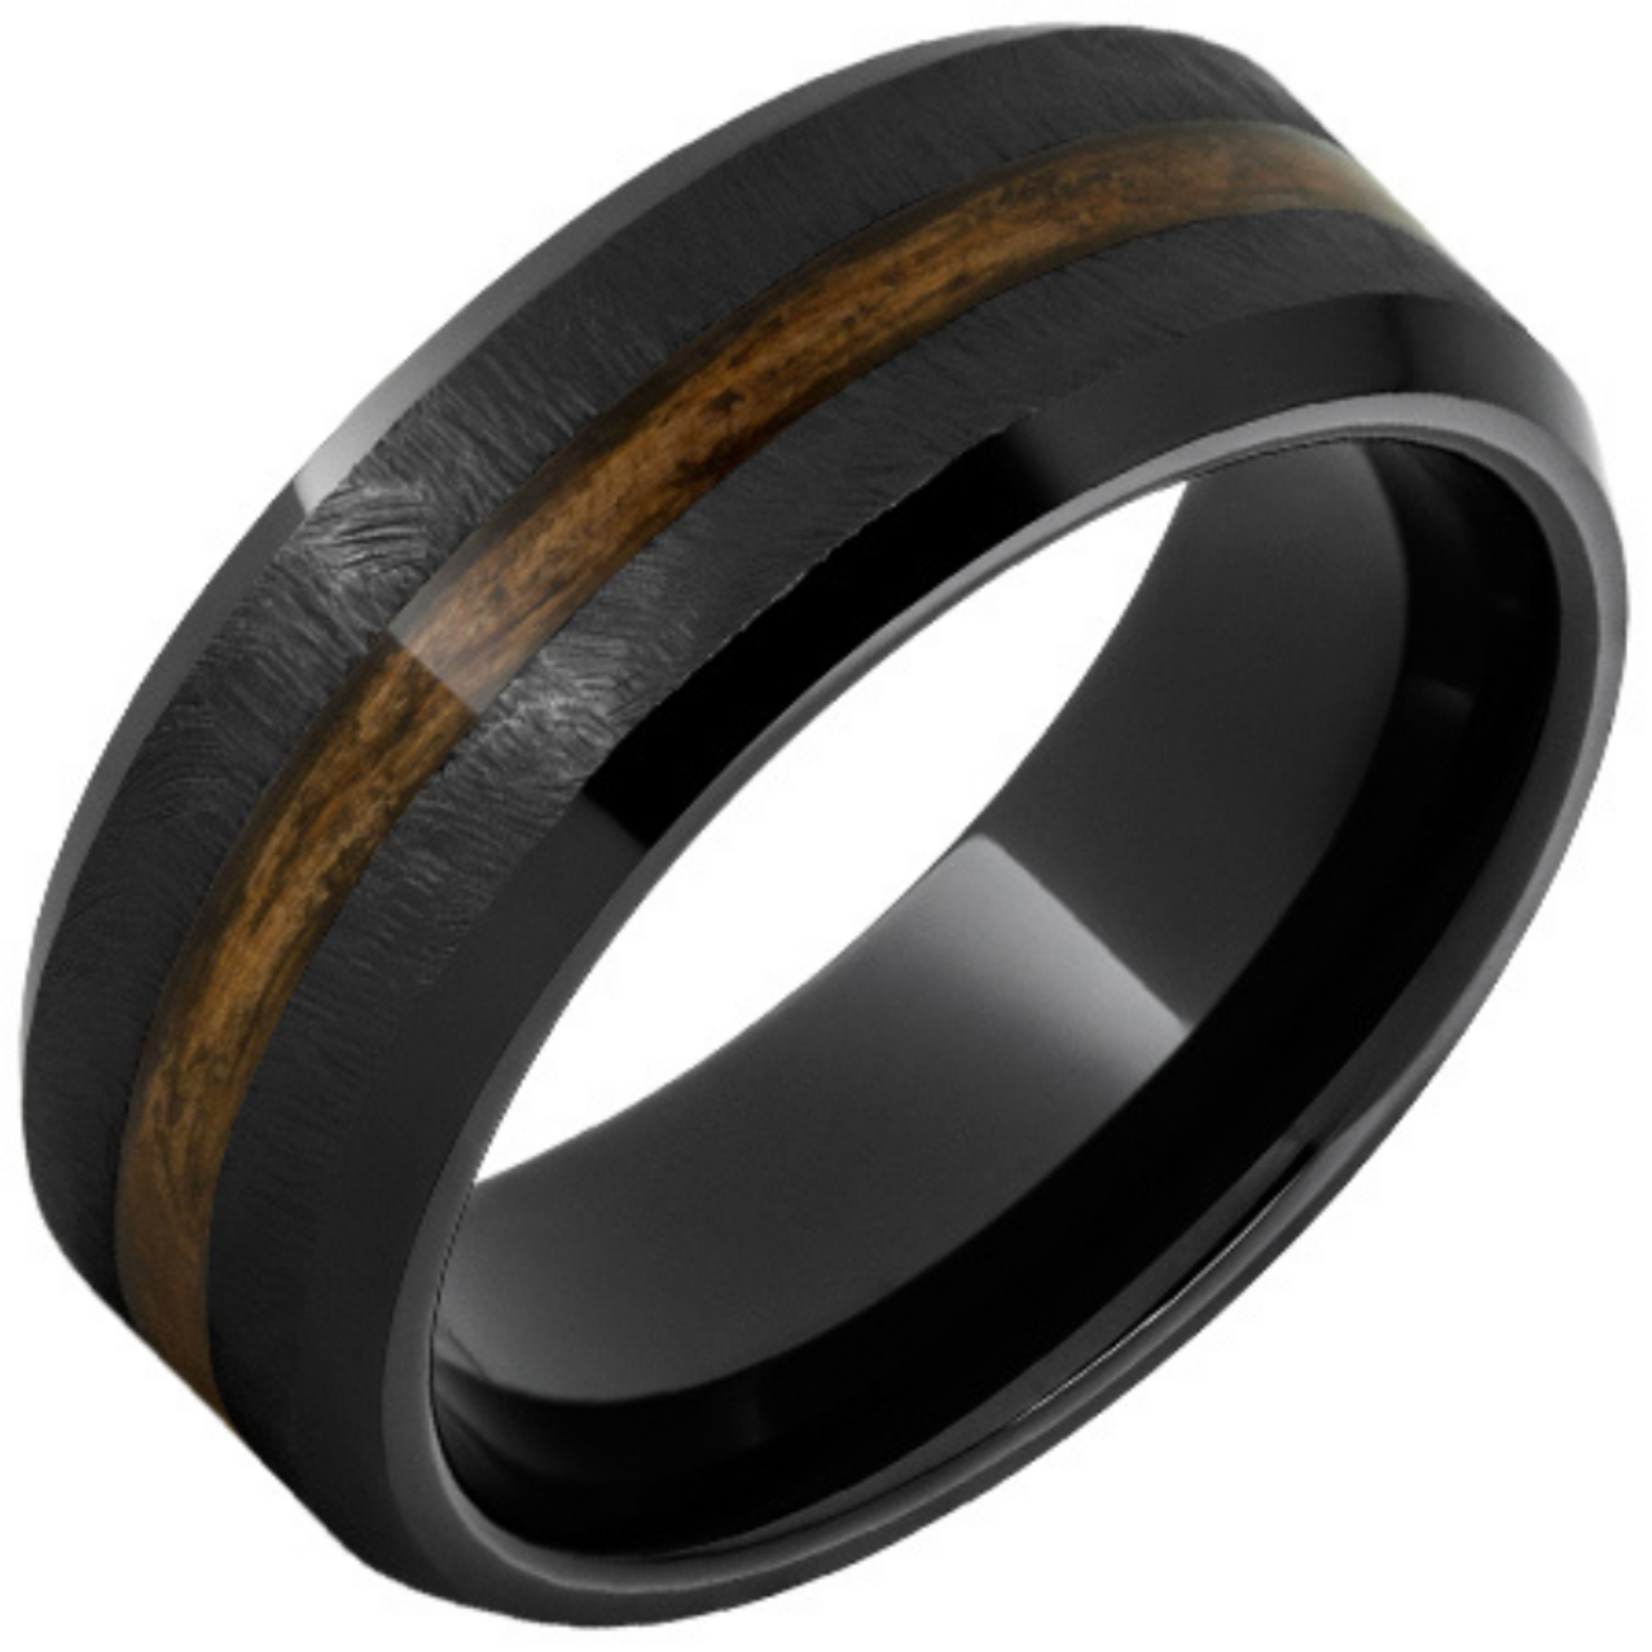 Serinium Wedding Bands Black Ceramic Beveled Edge Band with Bourbon Barrel Aged™ Inlay and Grain Finish